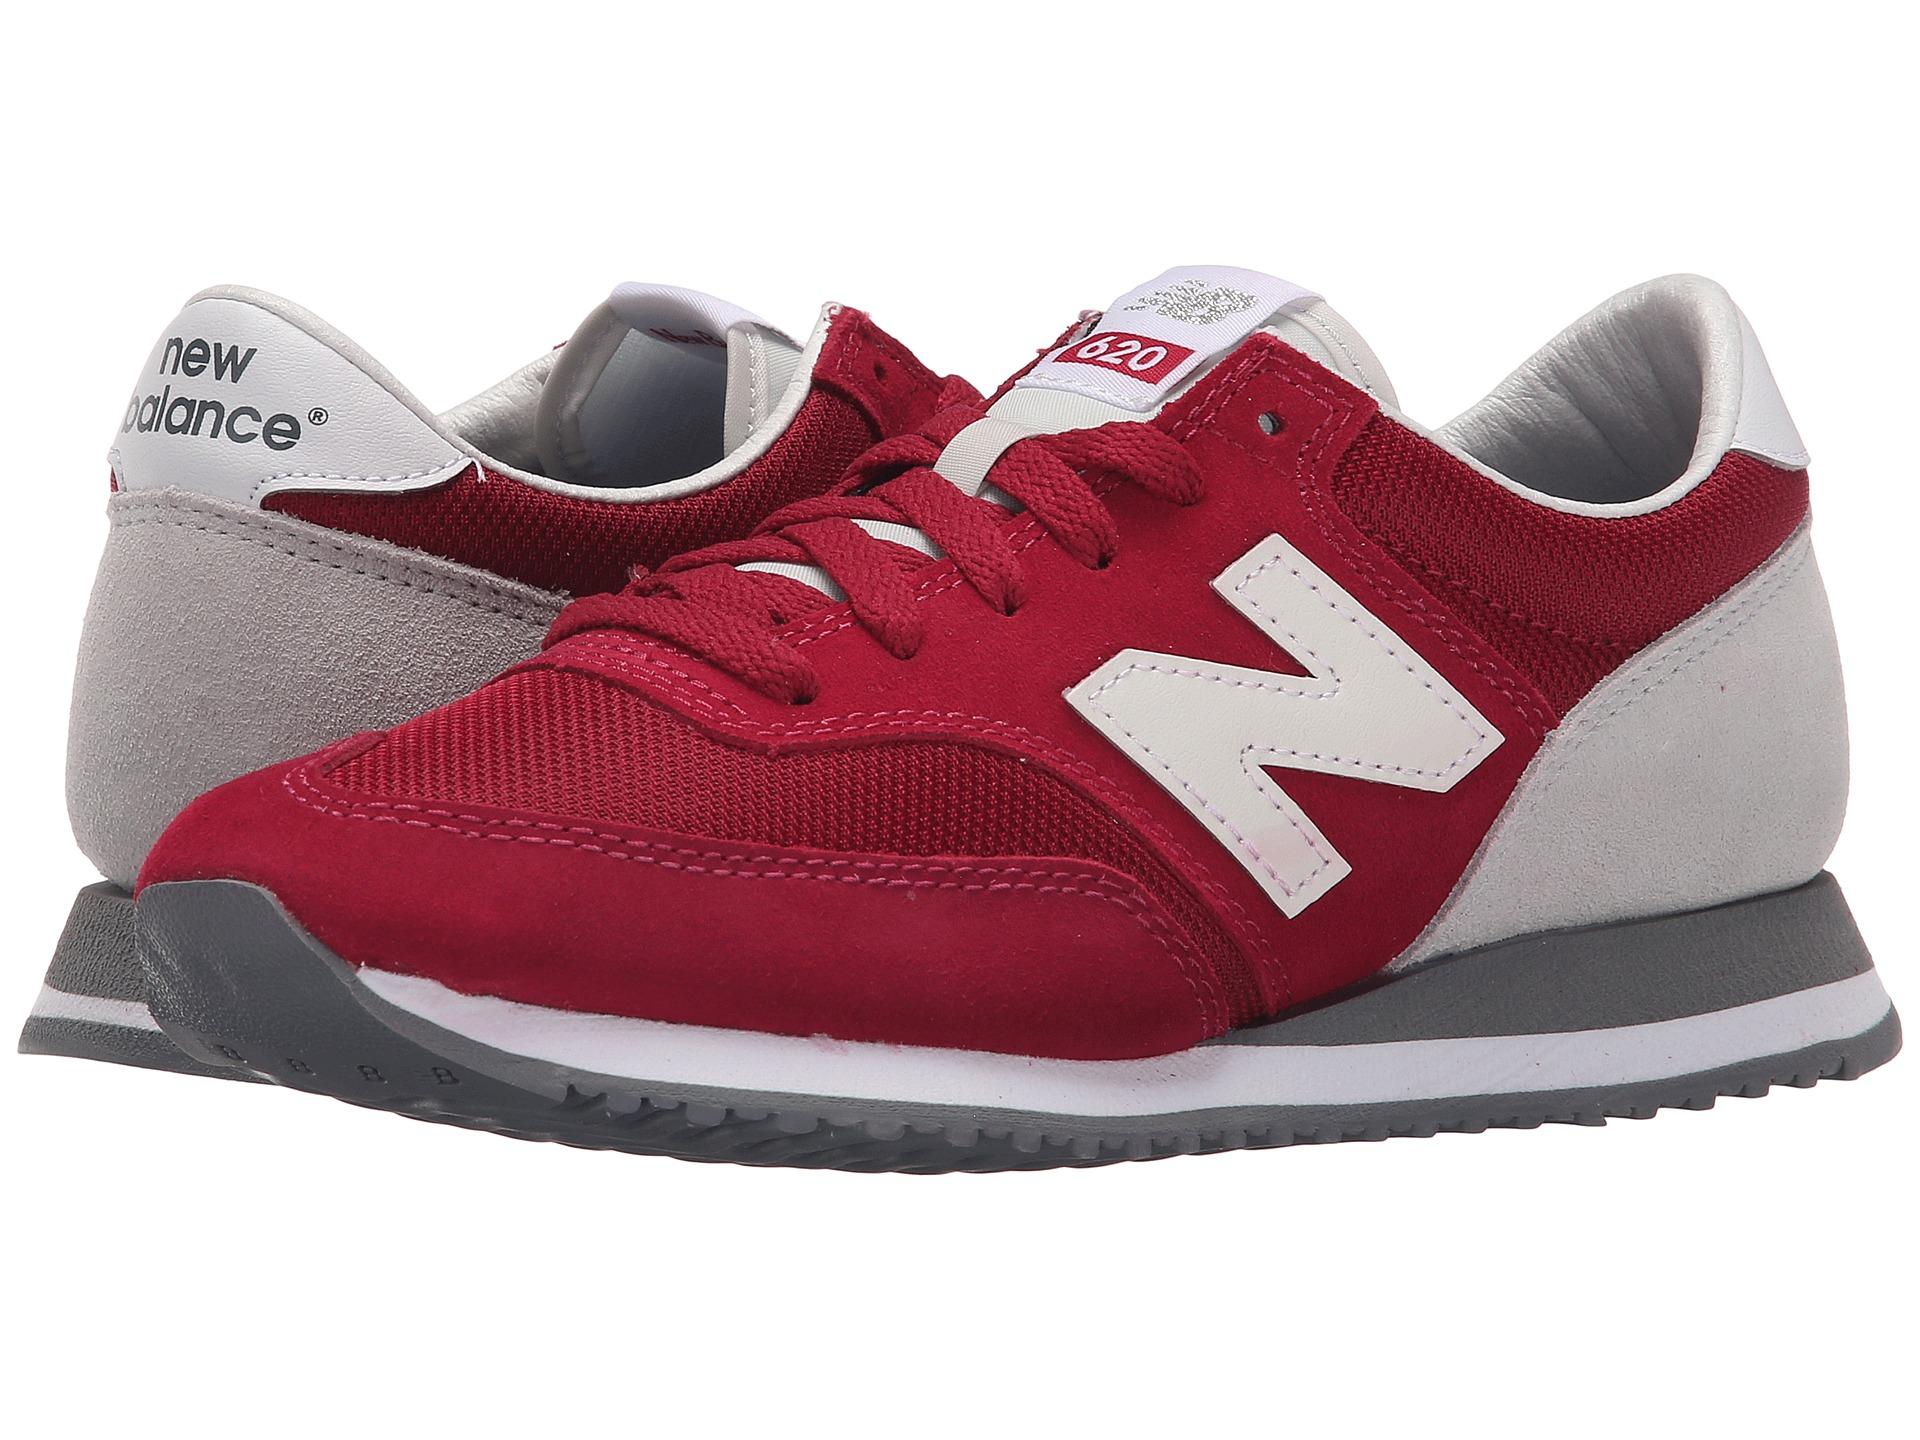 New Balance CW620 Red